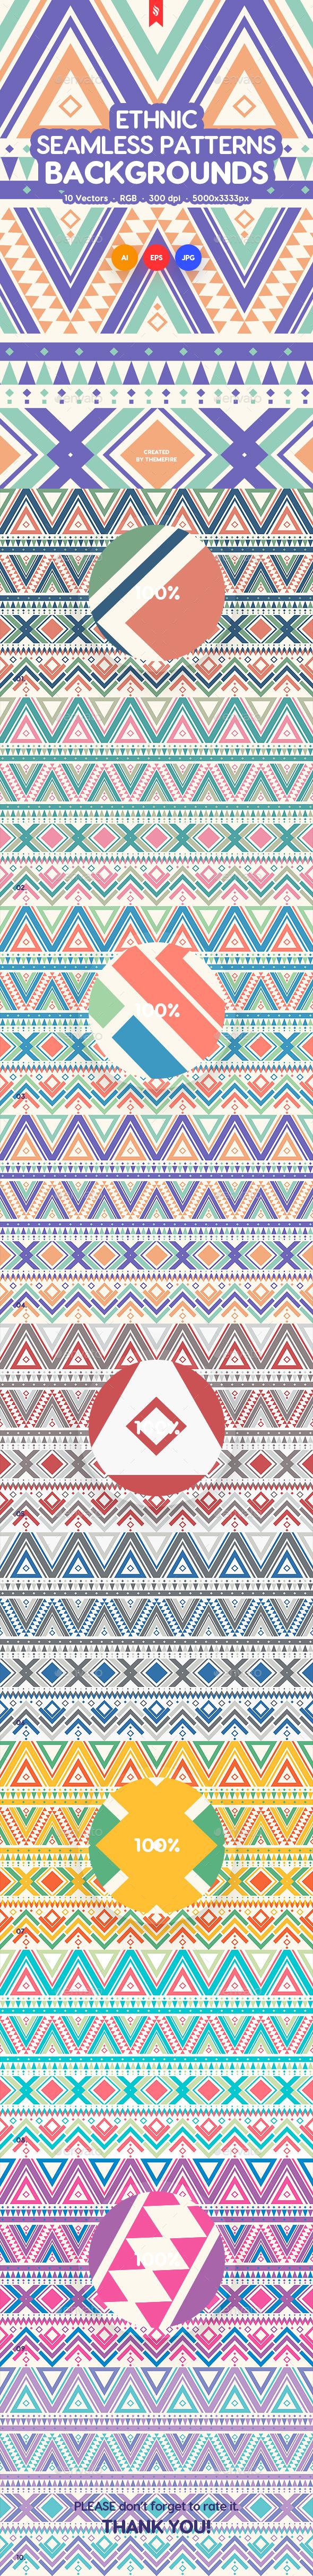 Ethnic Ornamental Seamless Patterns / Backgrounds - Patterns Backgrounds